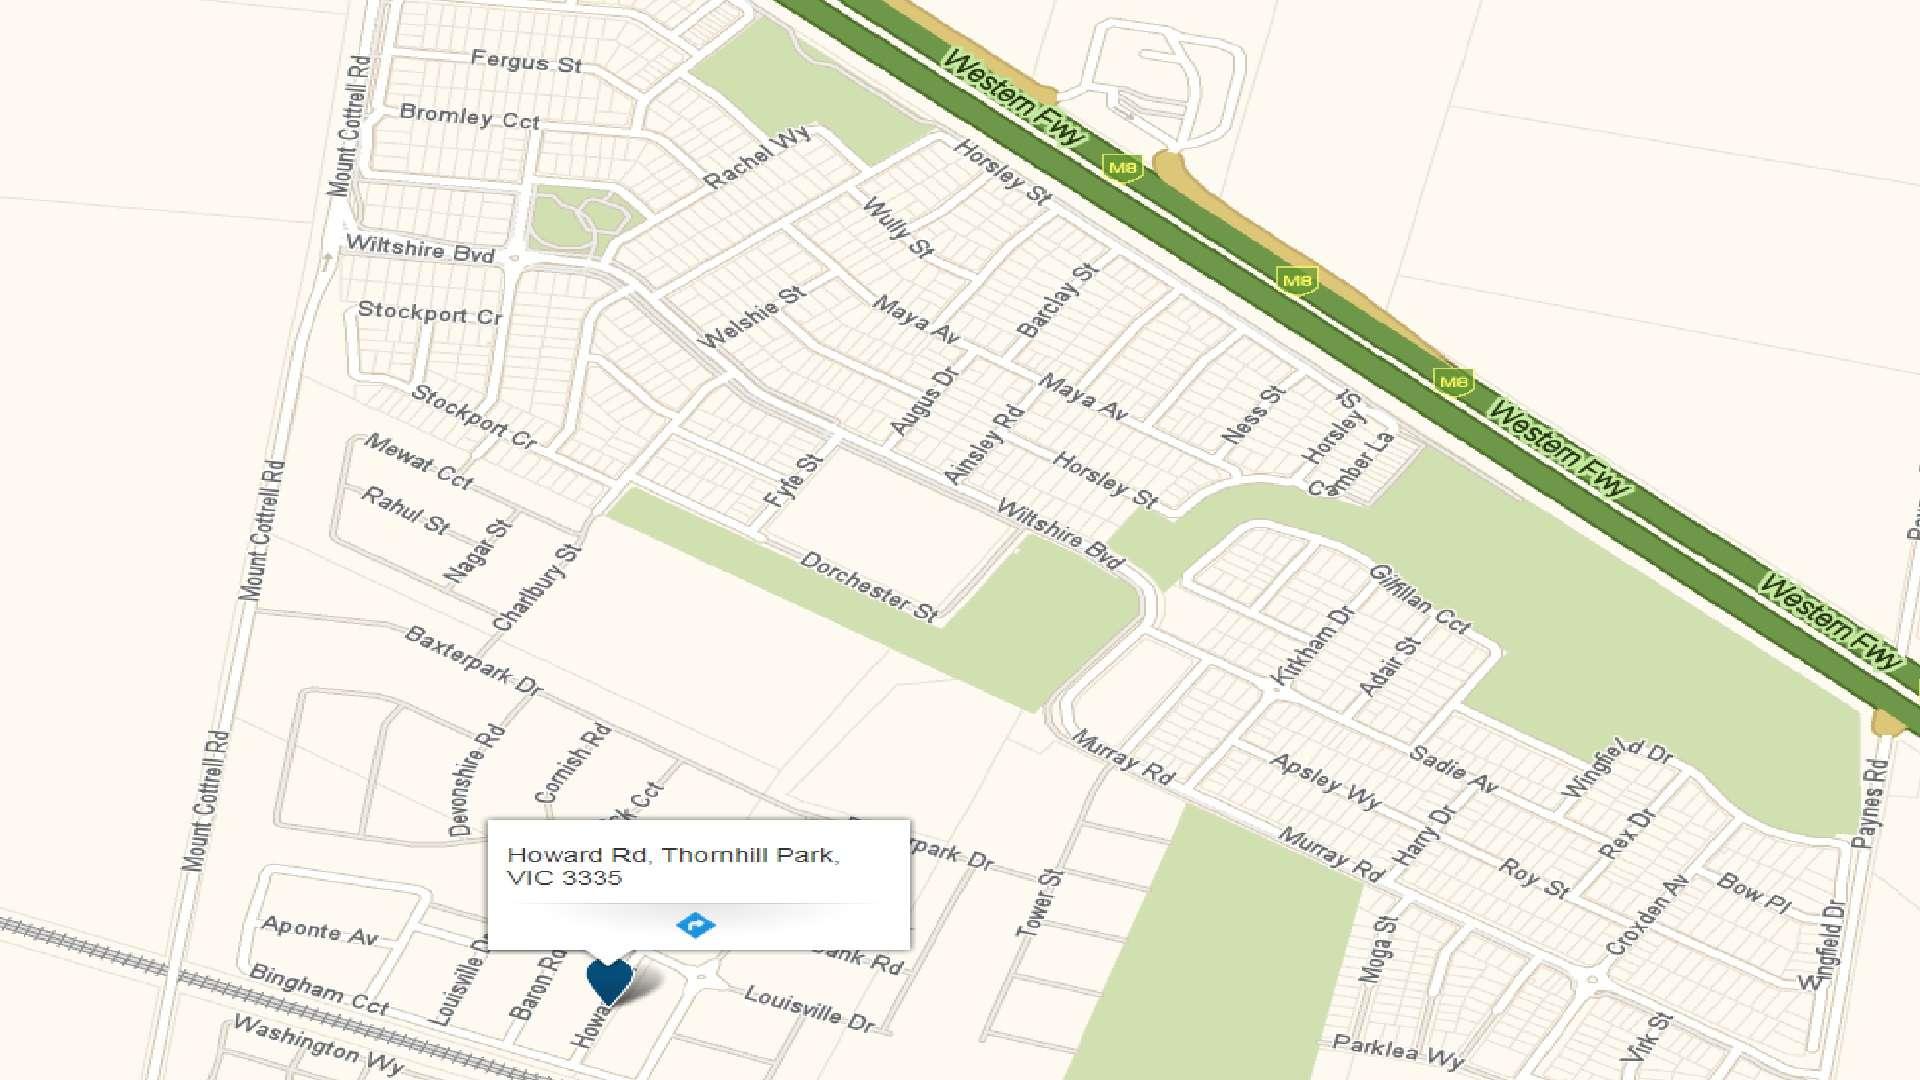 7 Howard Road, THORNHILL PARK, VIC 3335